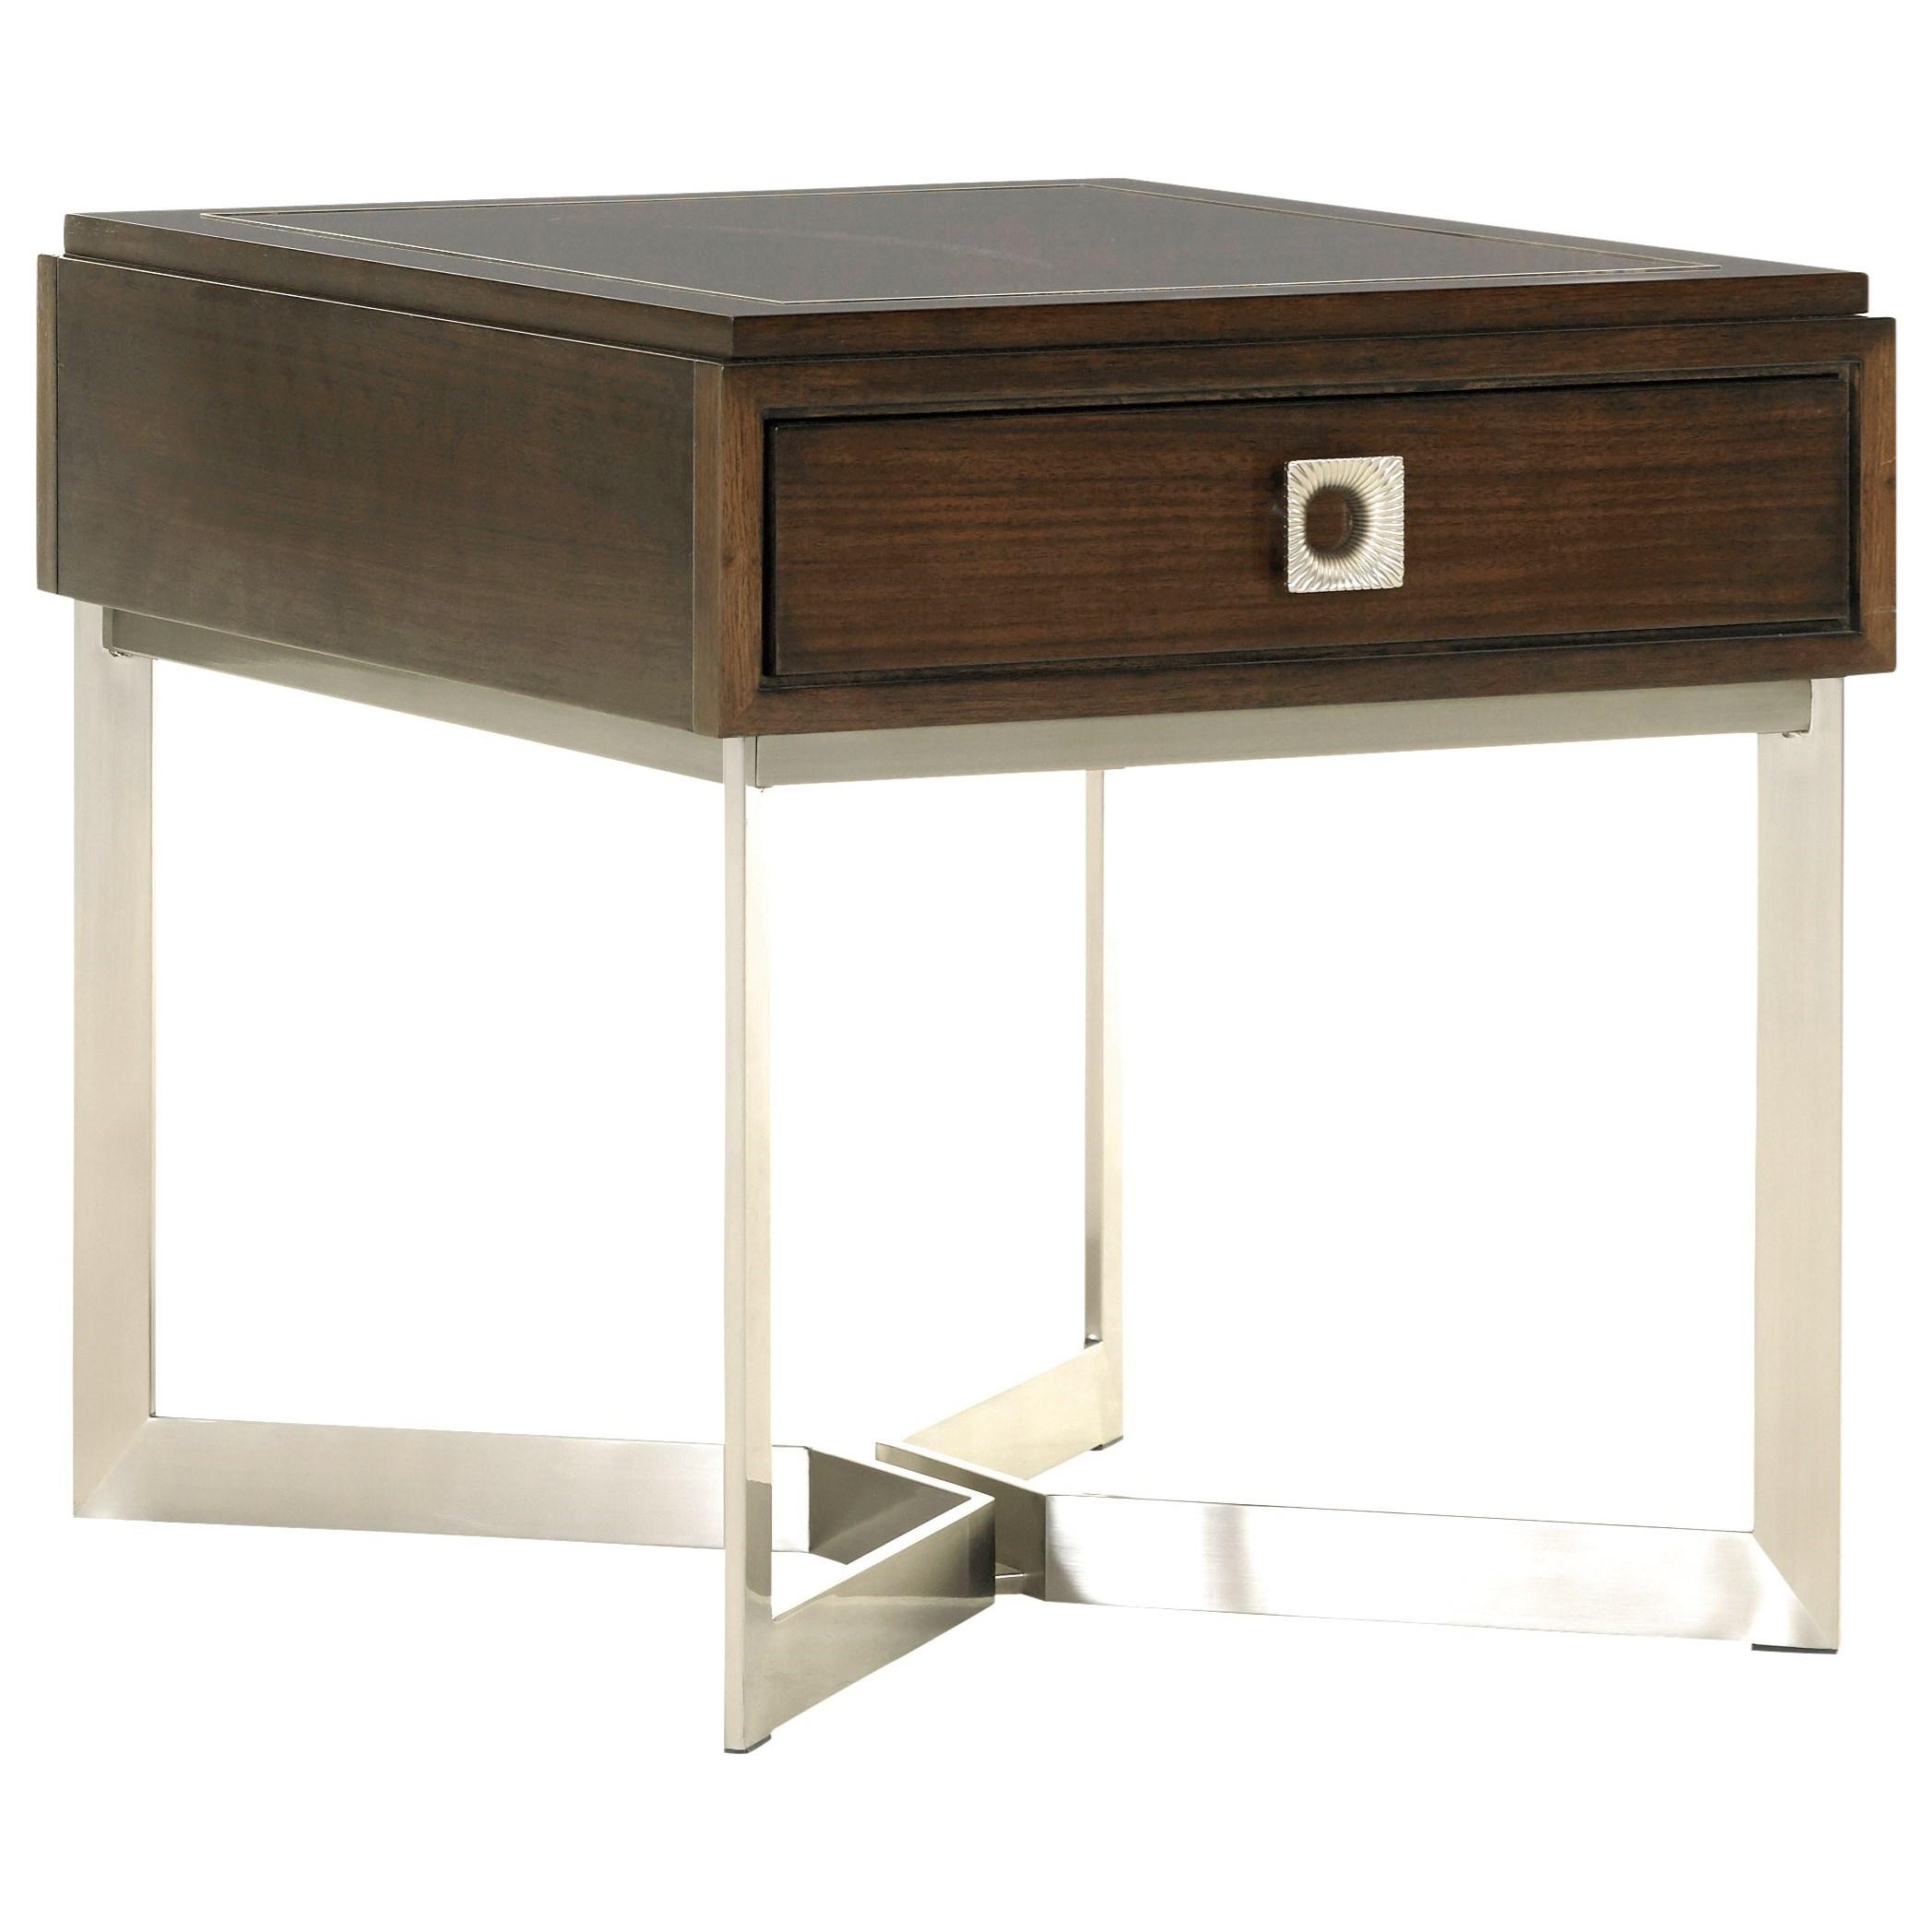 MacArthur Park Culver End Table by Lexington at Baer's Furniture